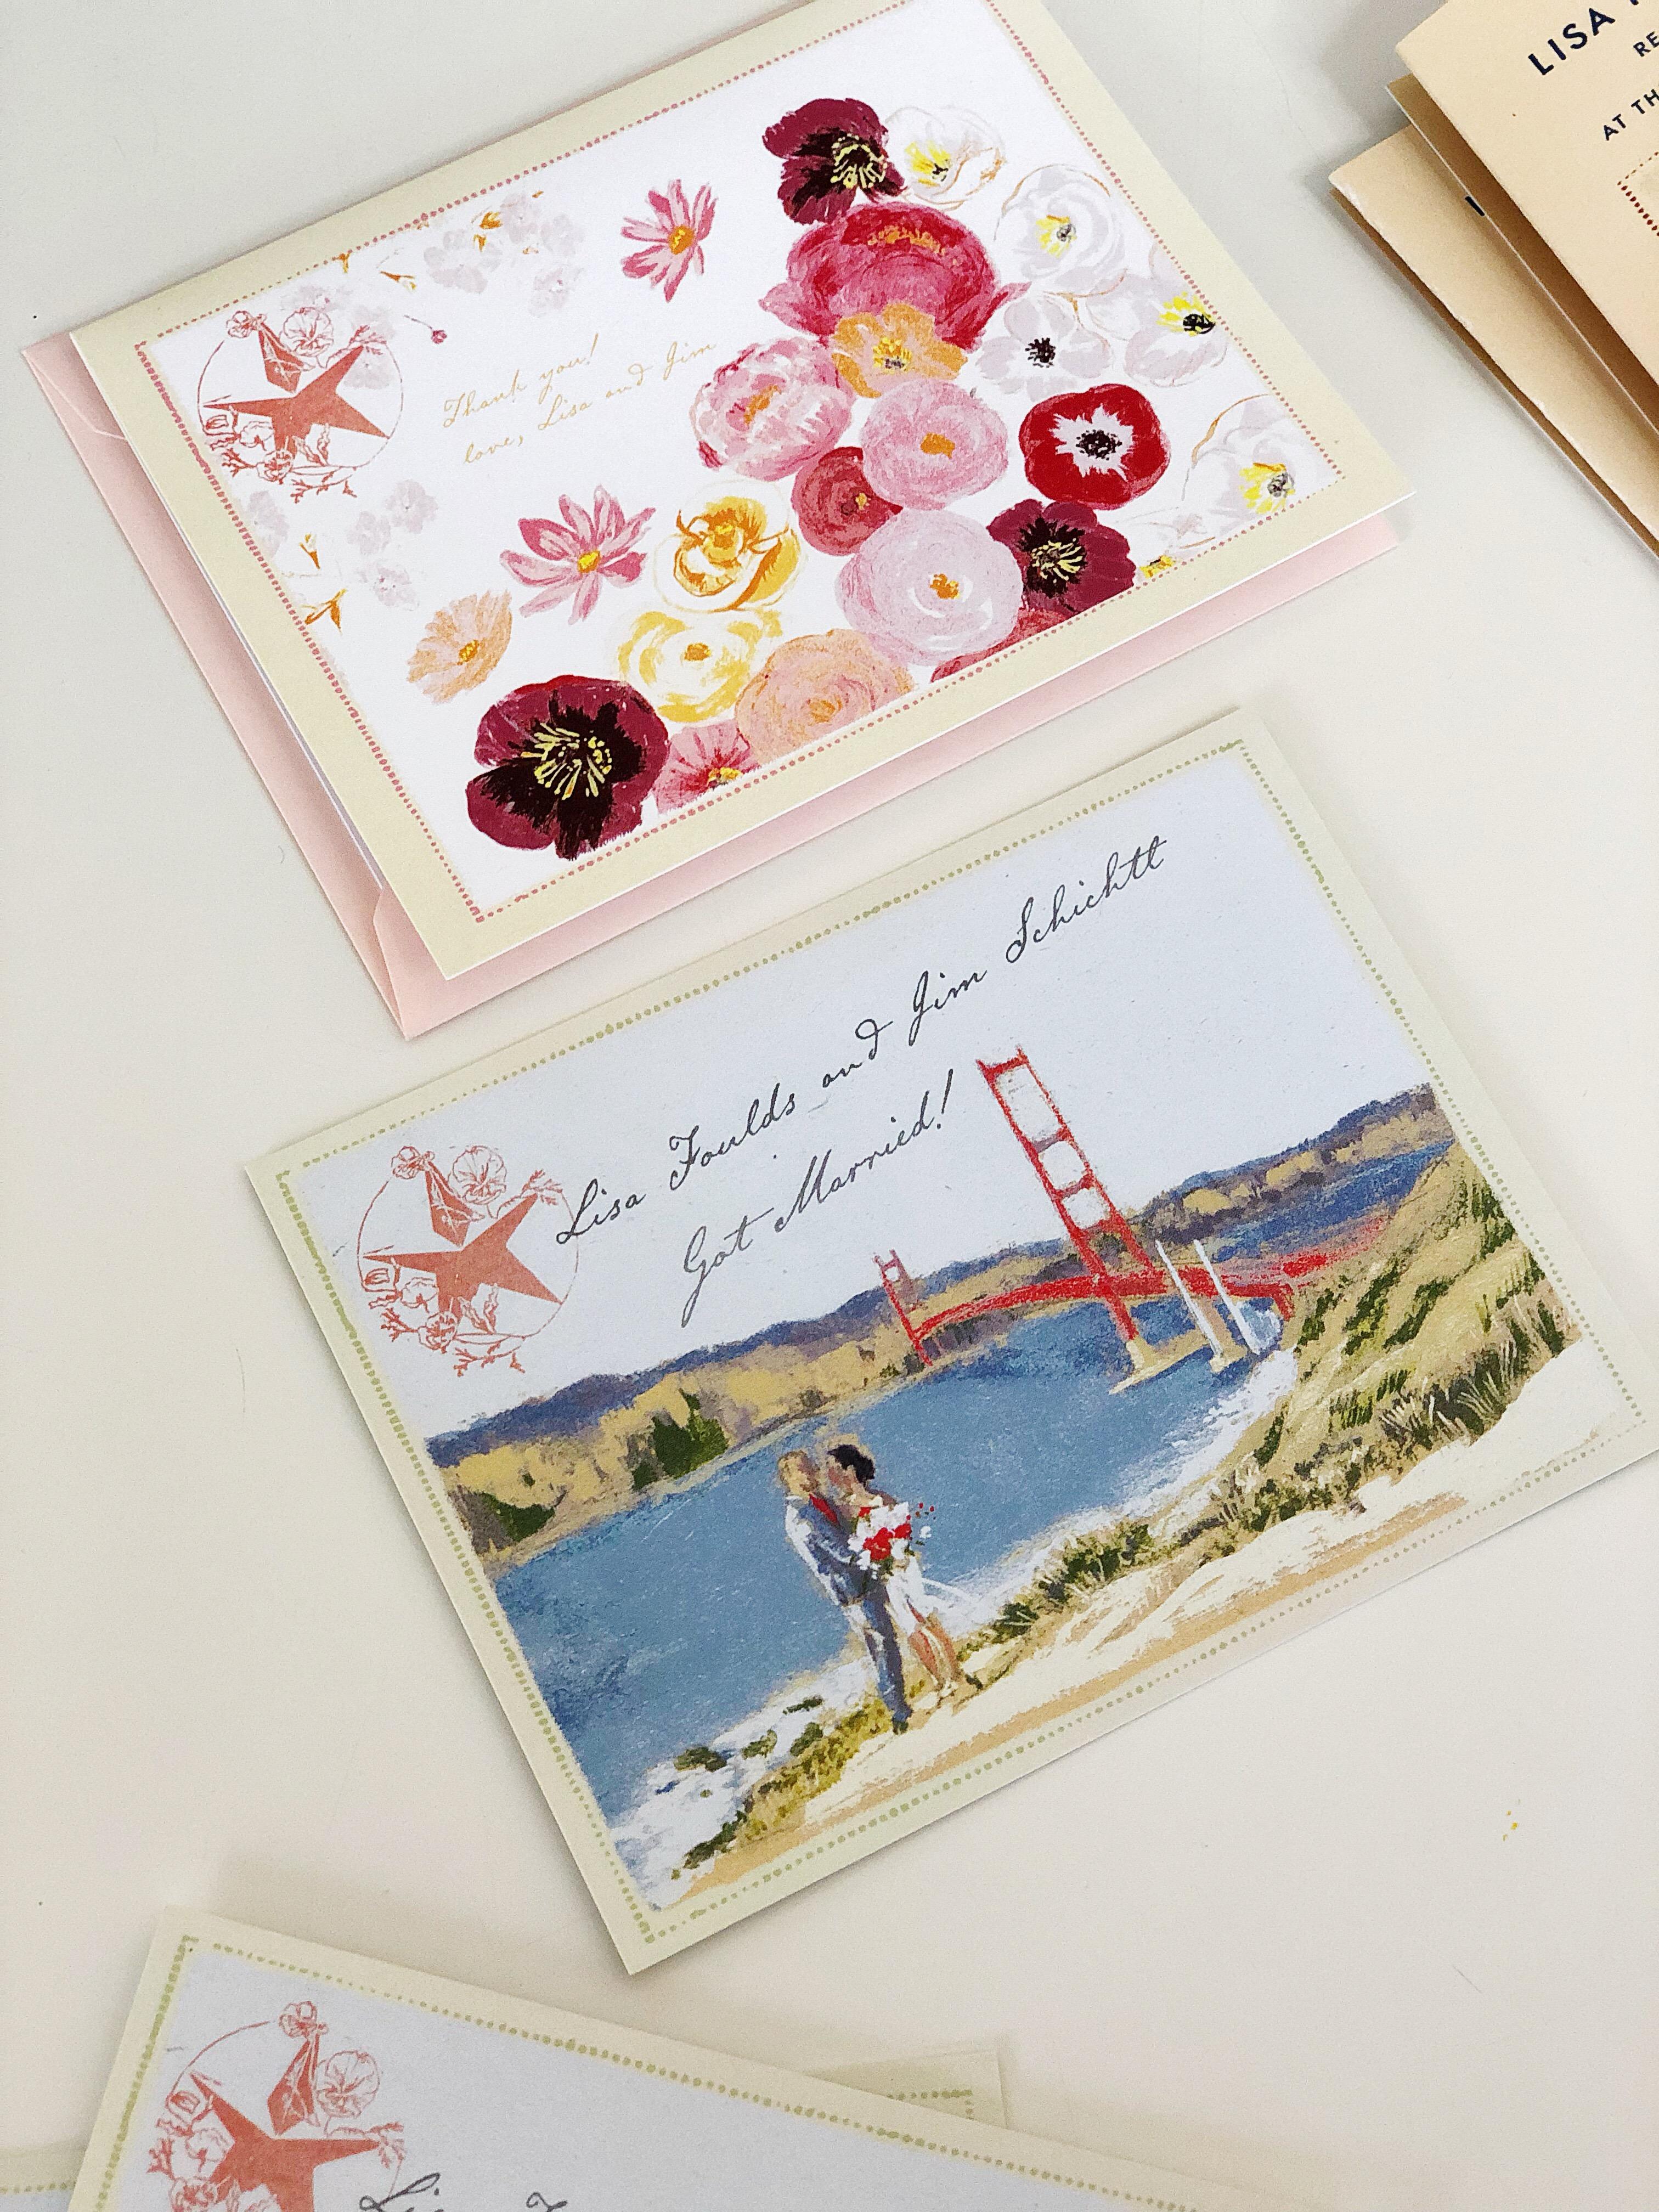 Wood-cut inspired design for Lisa and Jim's San Francisco , golden gate wedding